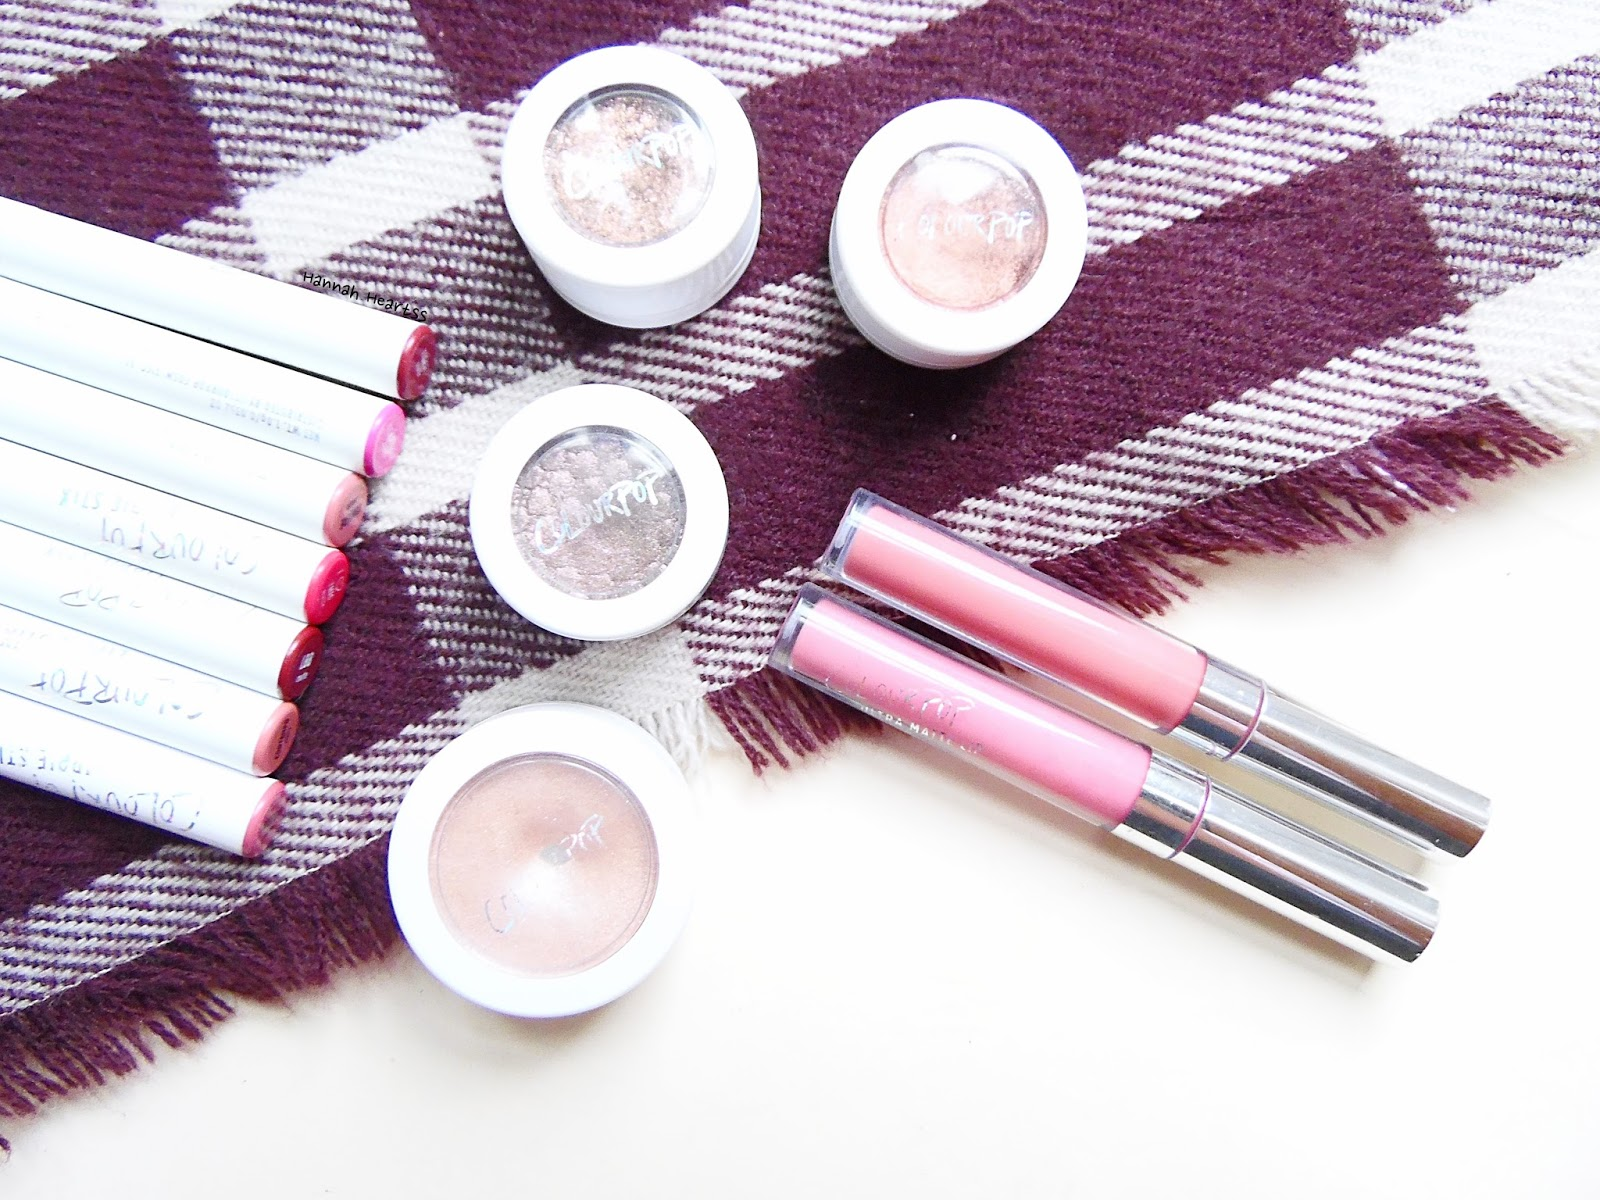 American Makeup Brands Uk | Makeupview co